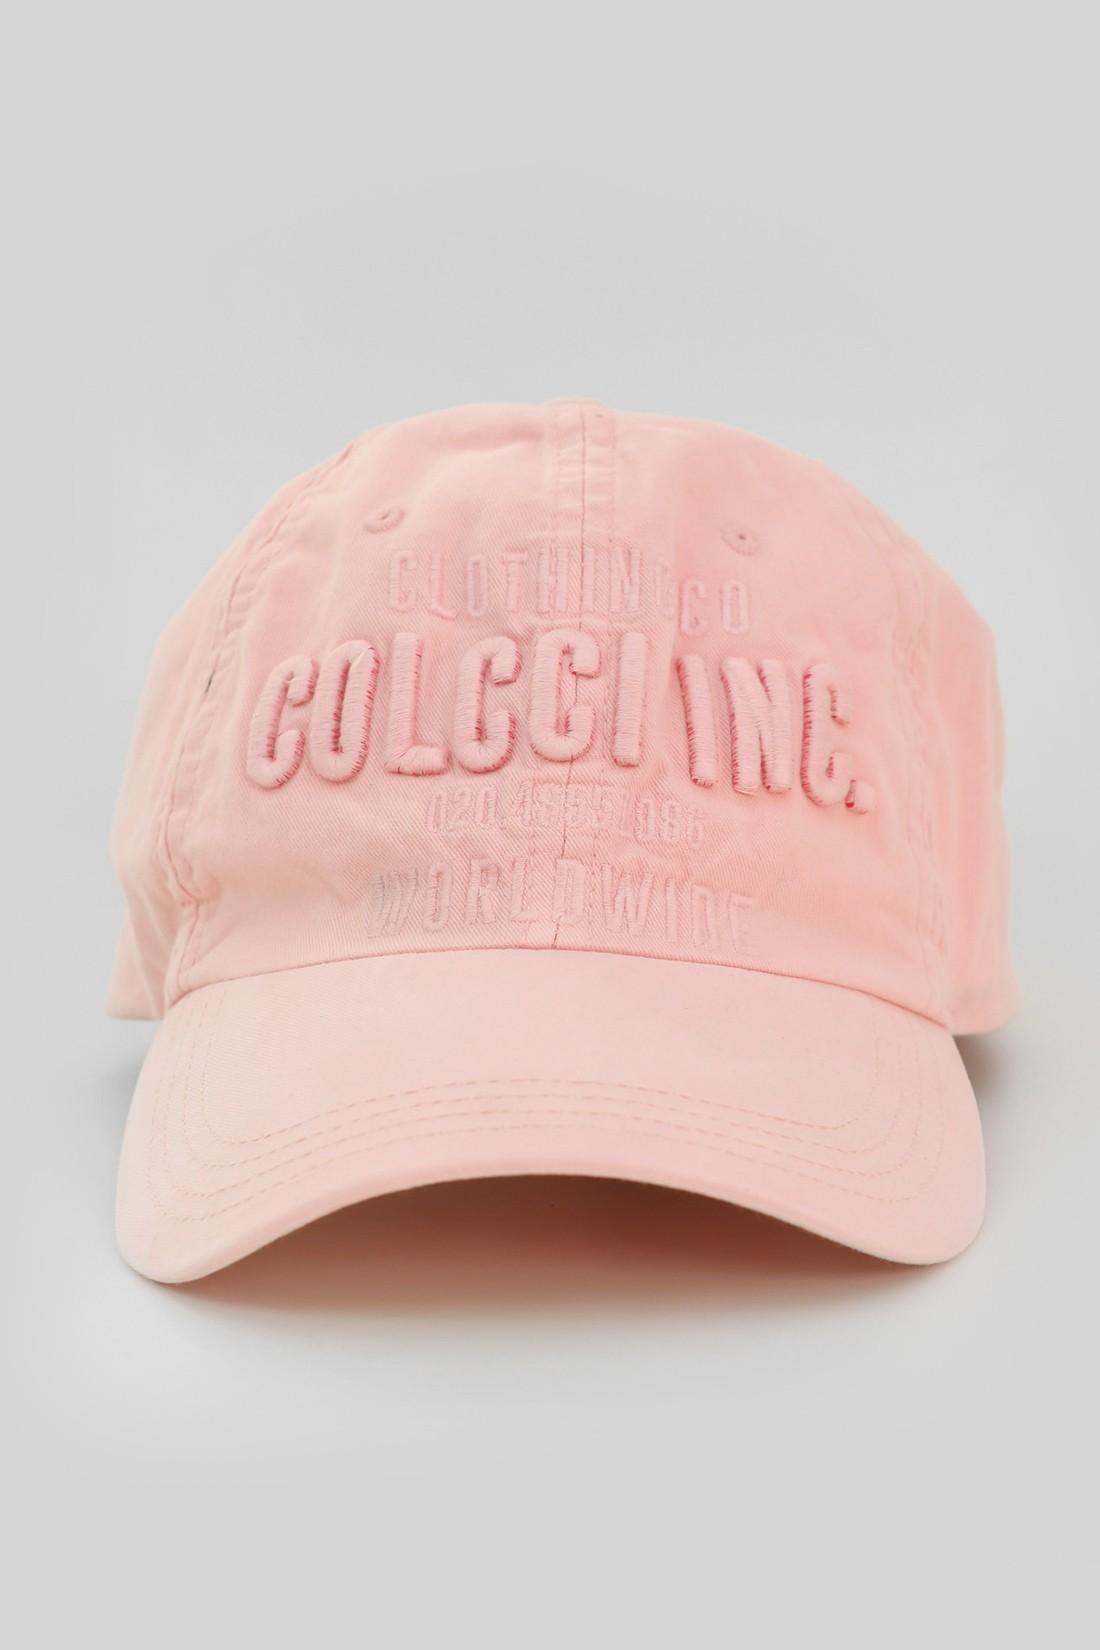 Bone Colcci Clothing Co